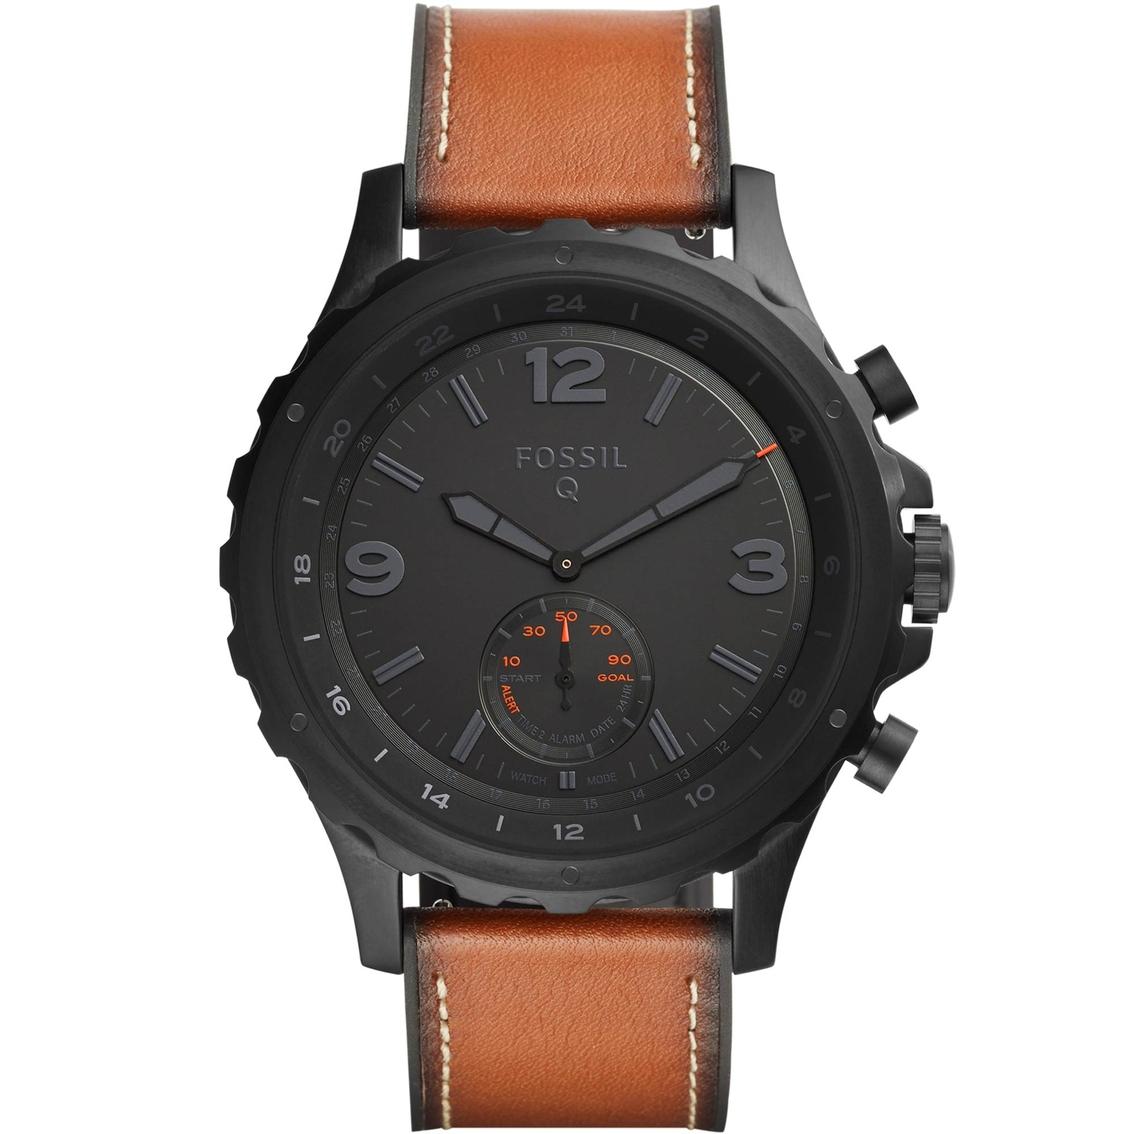 962026ef69b Fossil Men s Q Nate Dark Brown Leather Hybrid Smartwatch Ftw1114 ...